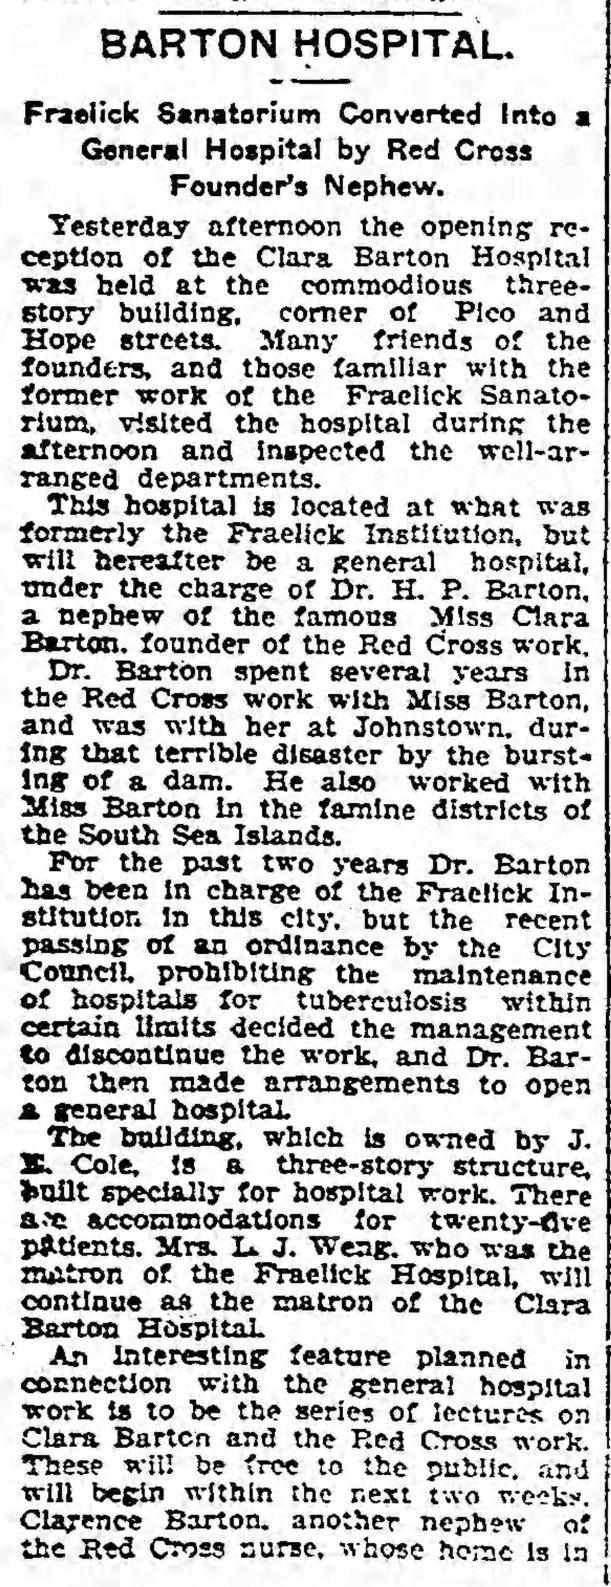 The_Los_Angeles_Times_Fri__Jul_8__1904_